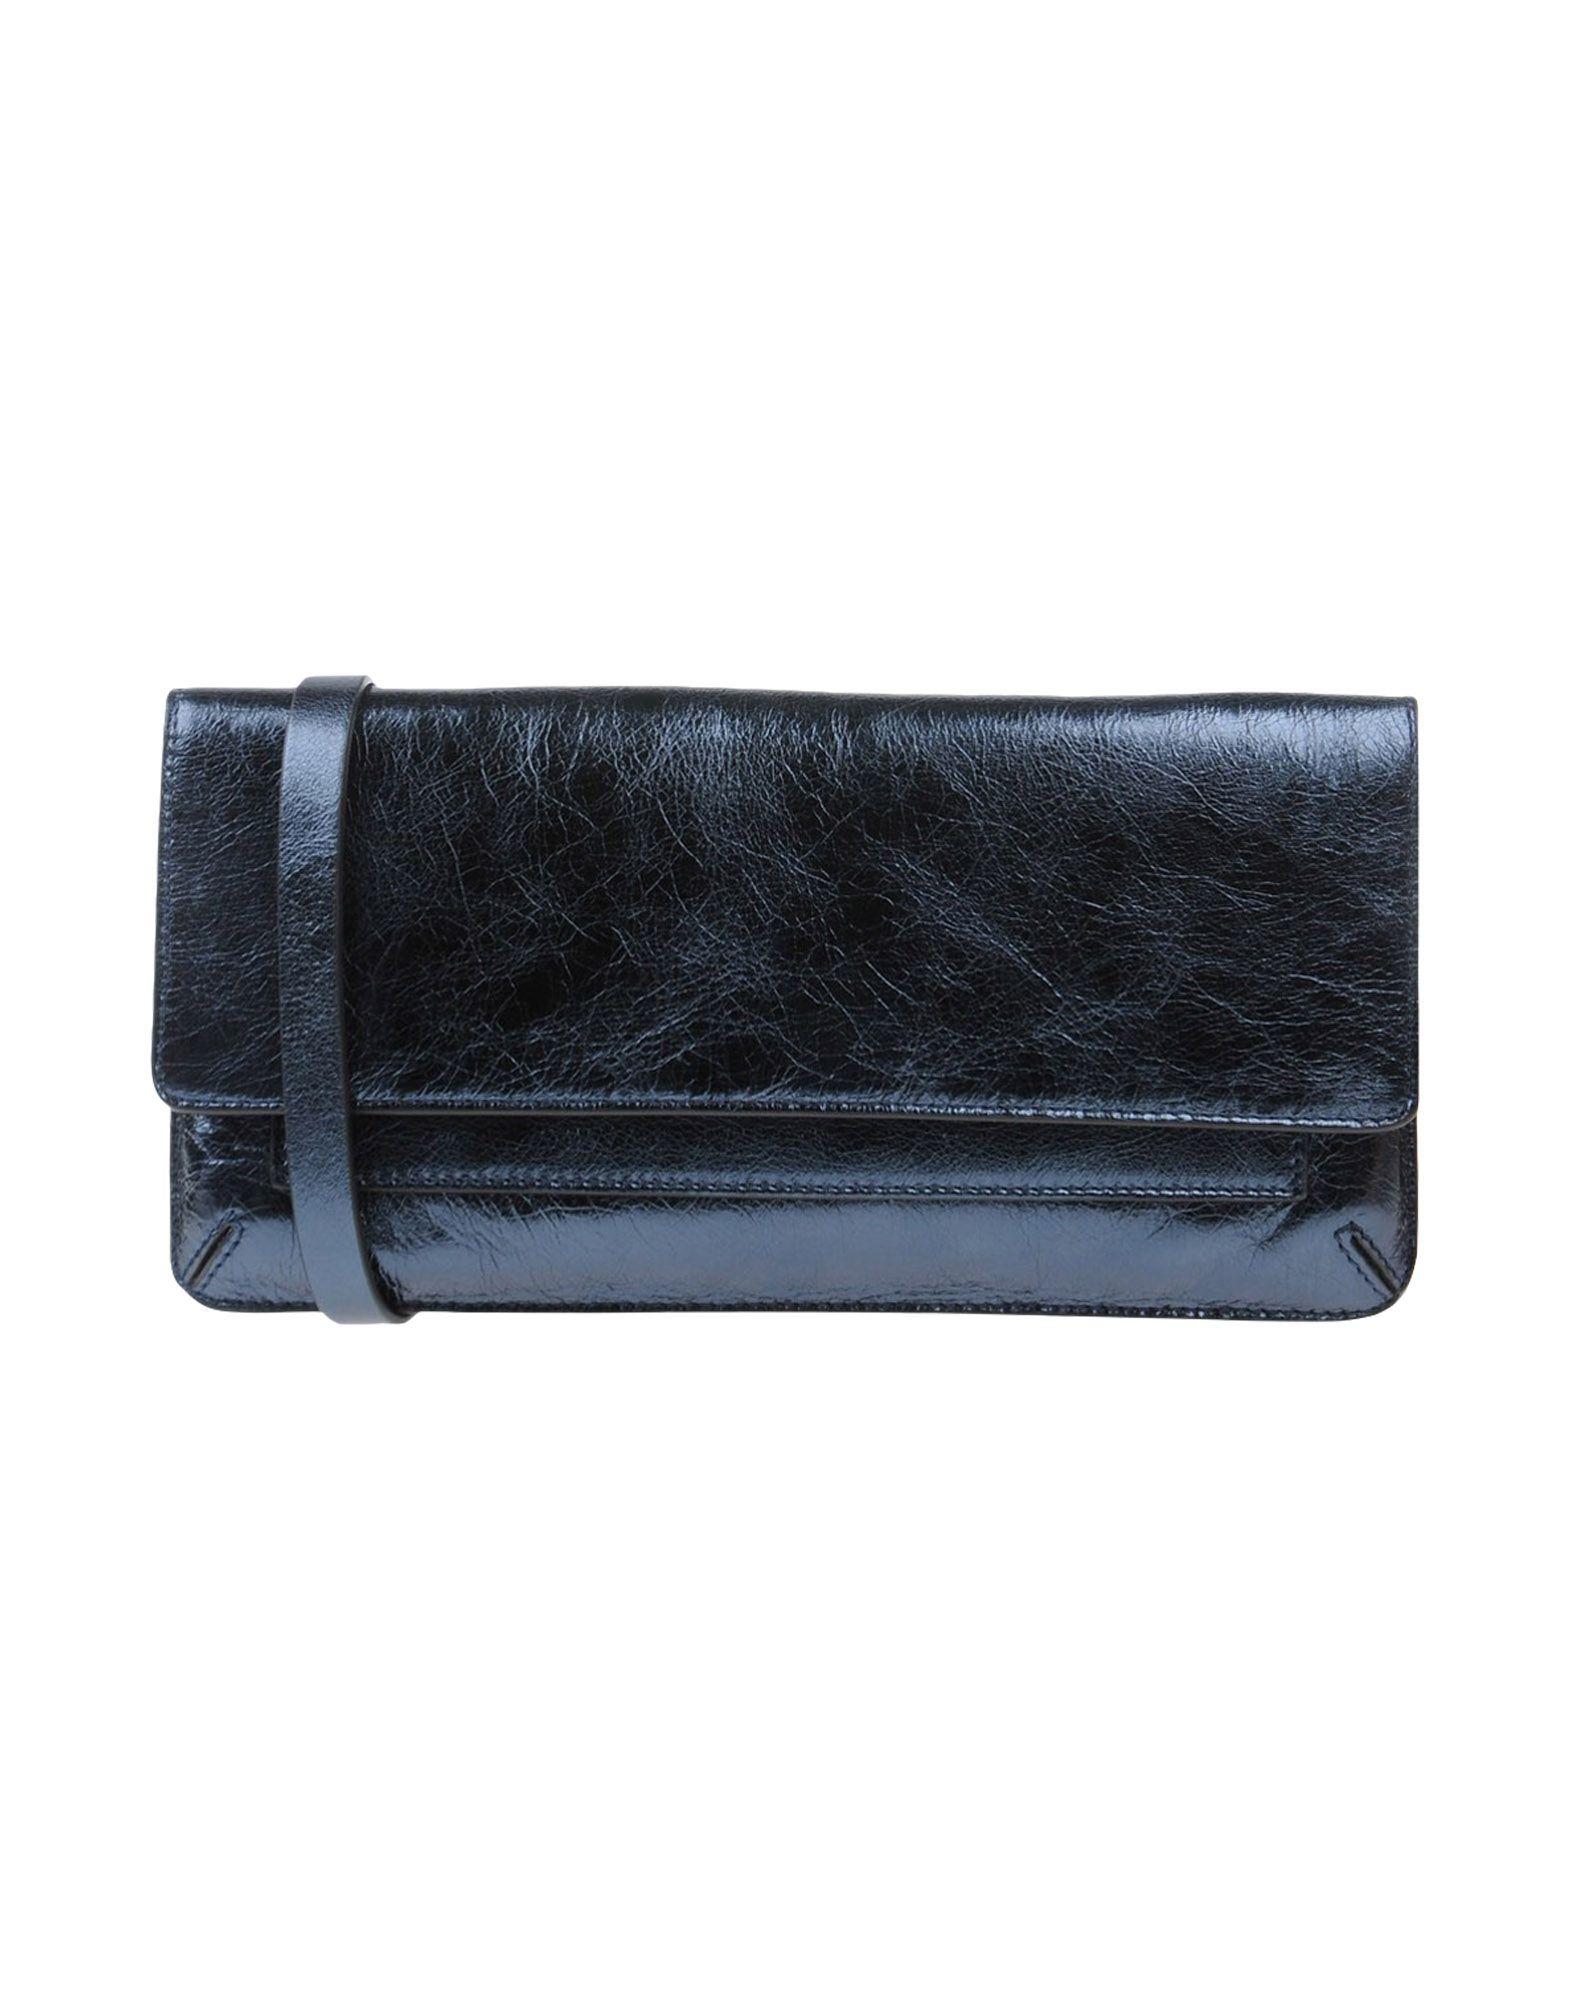 DIESEL BLACK GOLD Сумка на руку ремень мужской diesel цвет коричневый x03964 ps978 размер 90